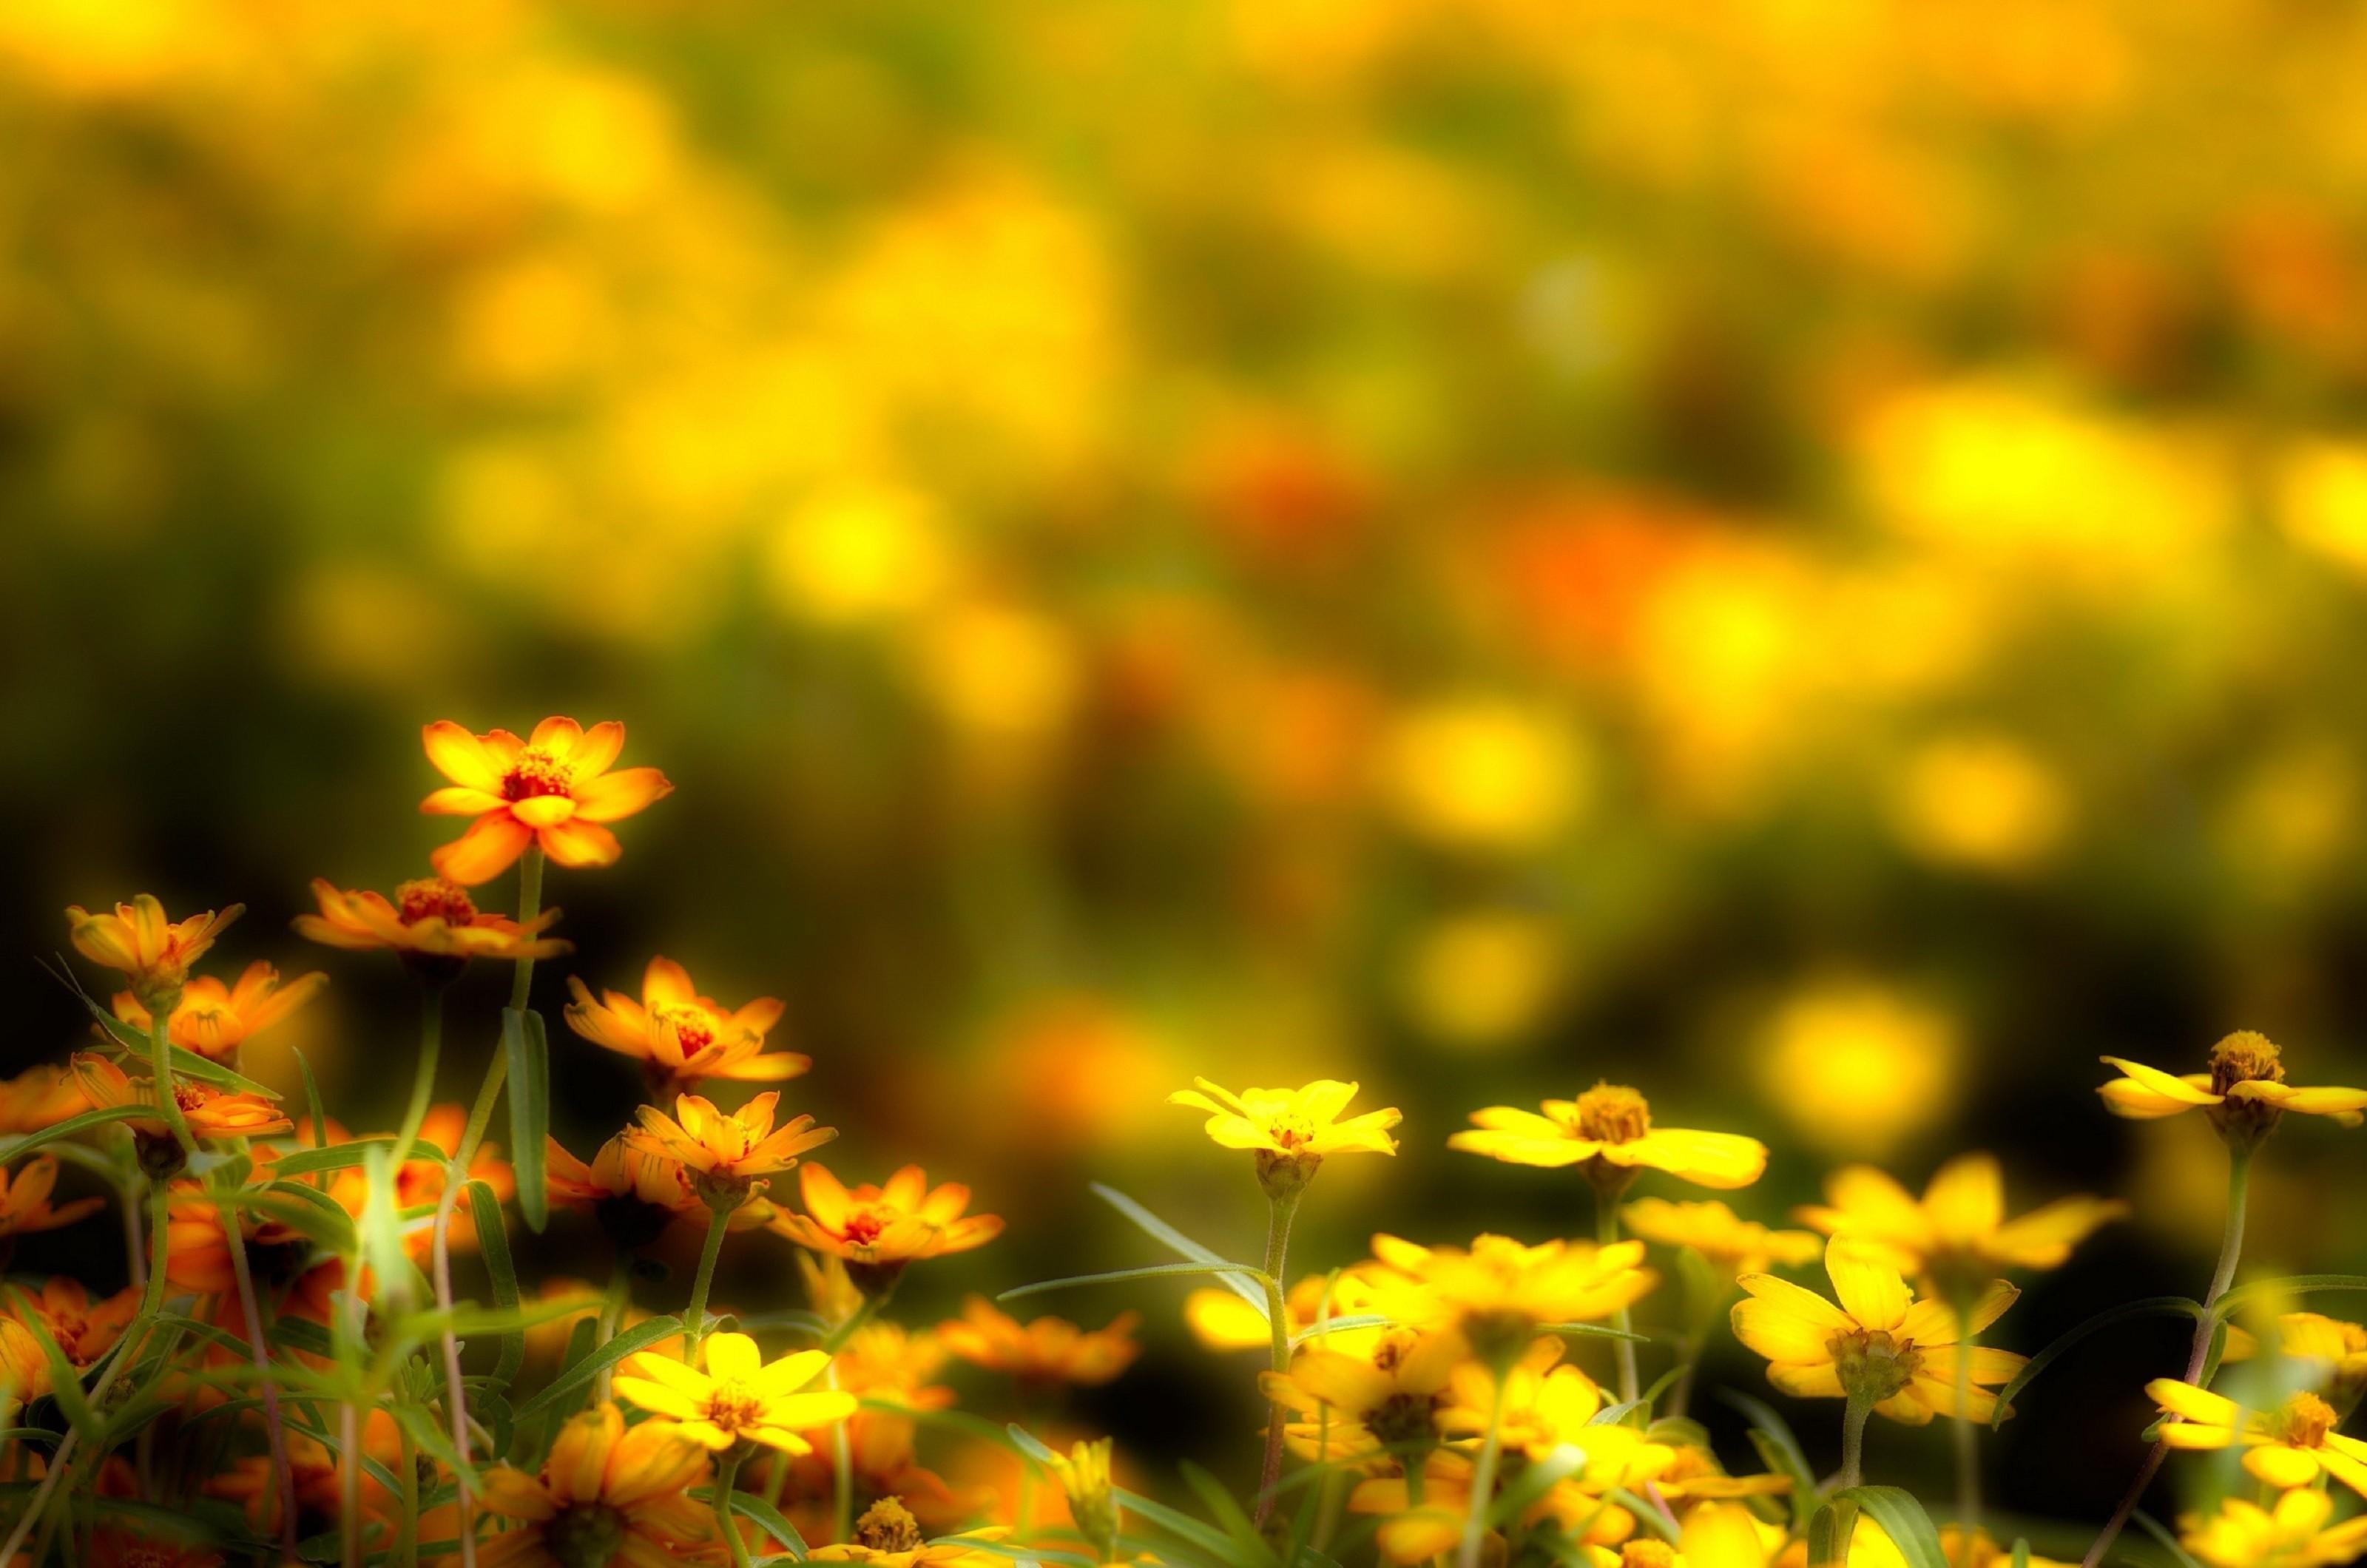 желтые ромашки макро бесплатно